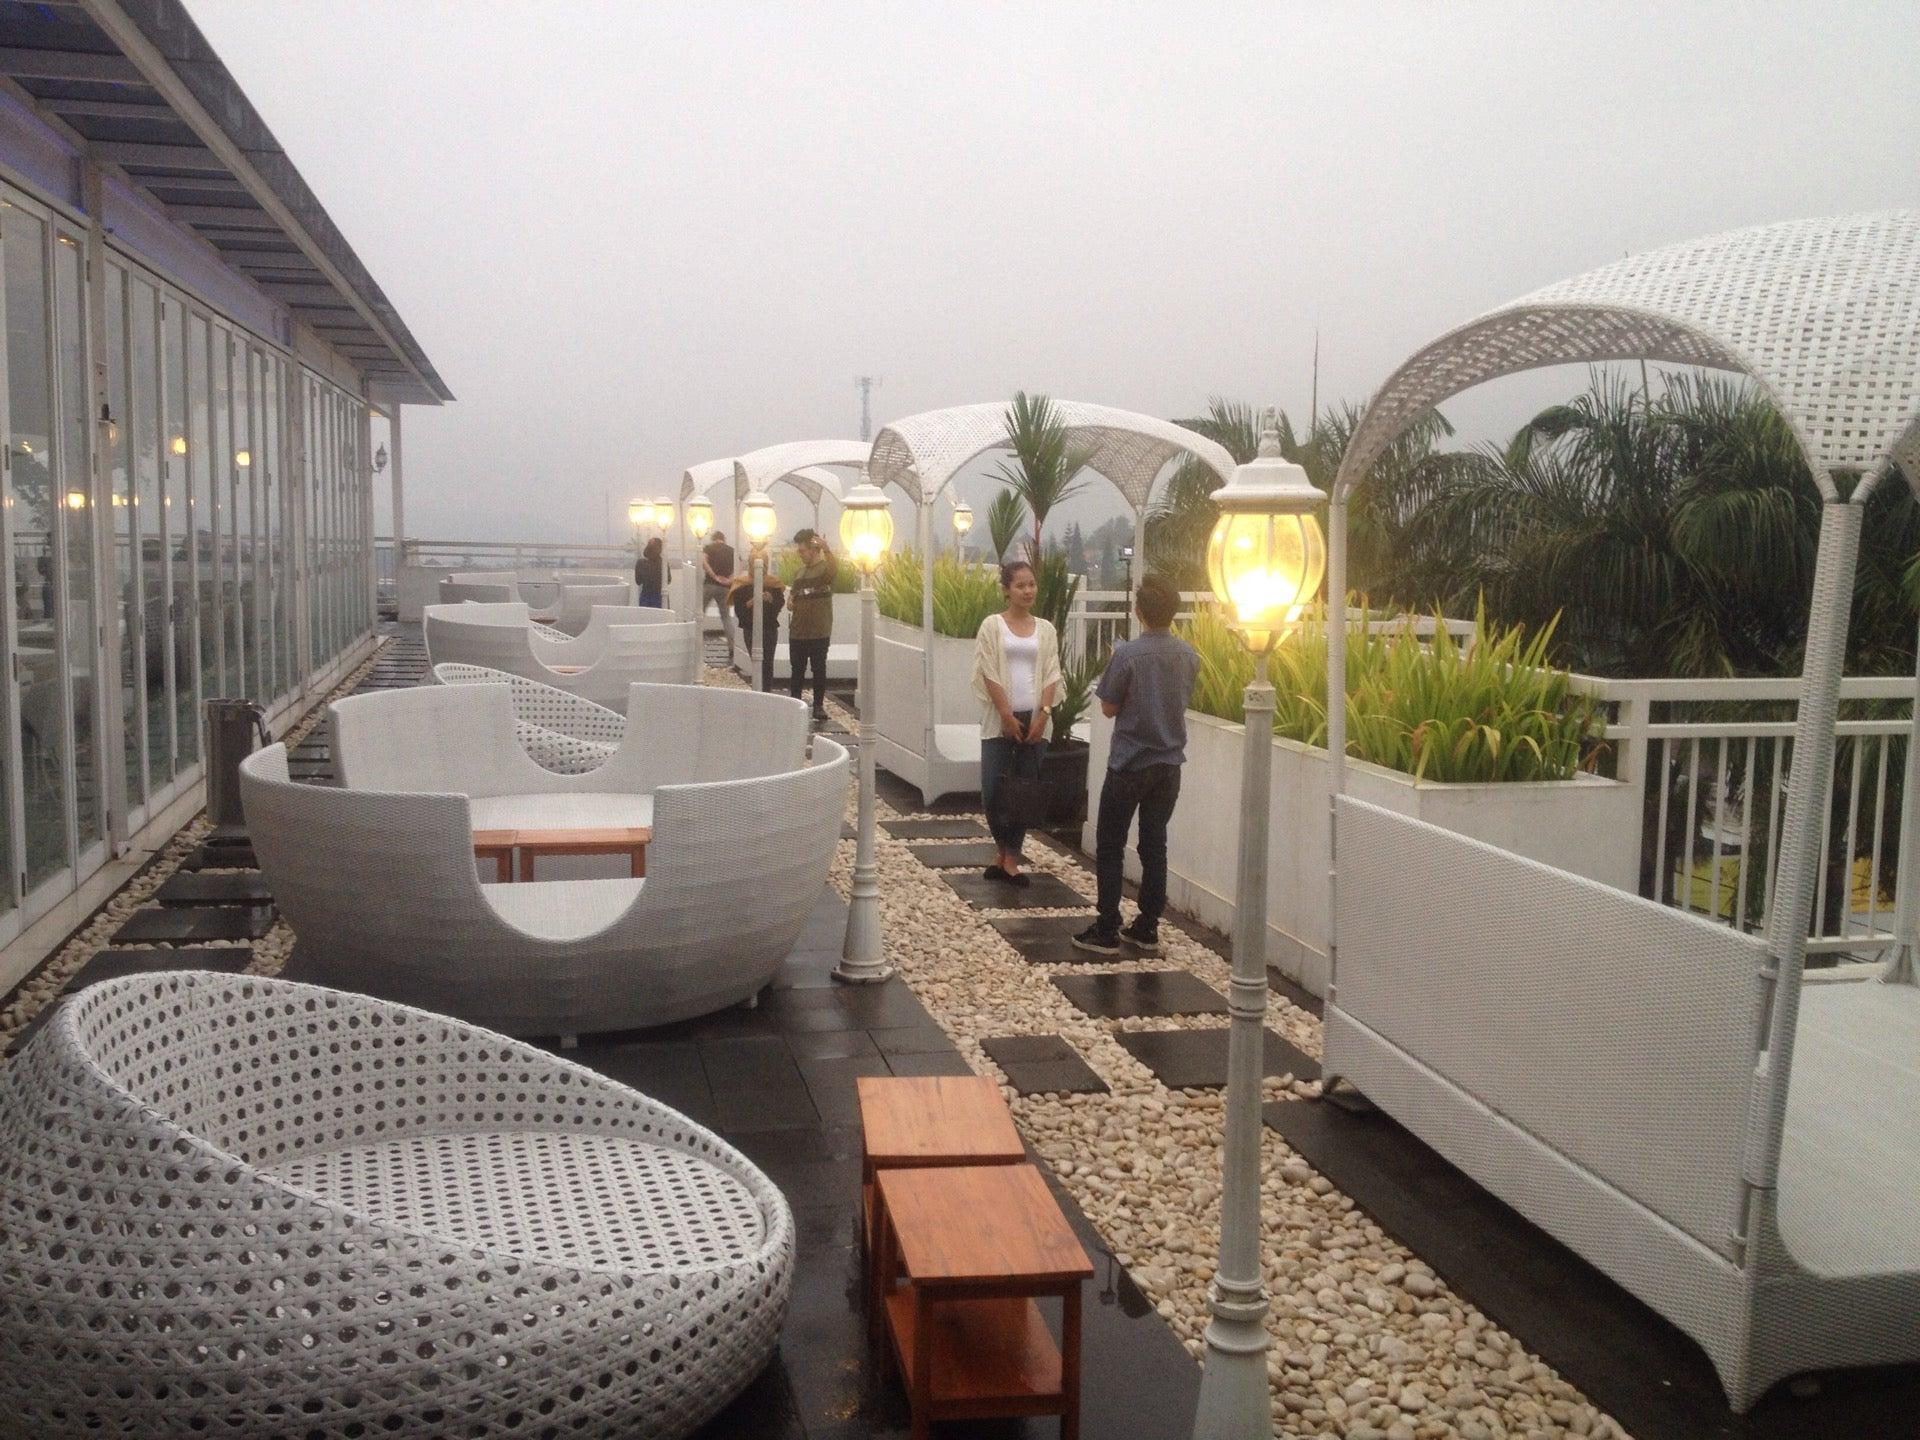 Nicole S Kitchen Lounge In Puncak Jakarta Openrice Indonesia